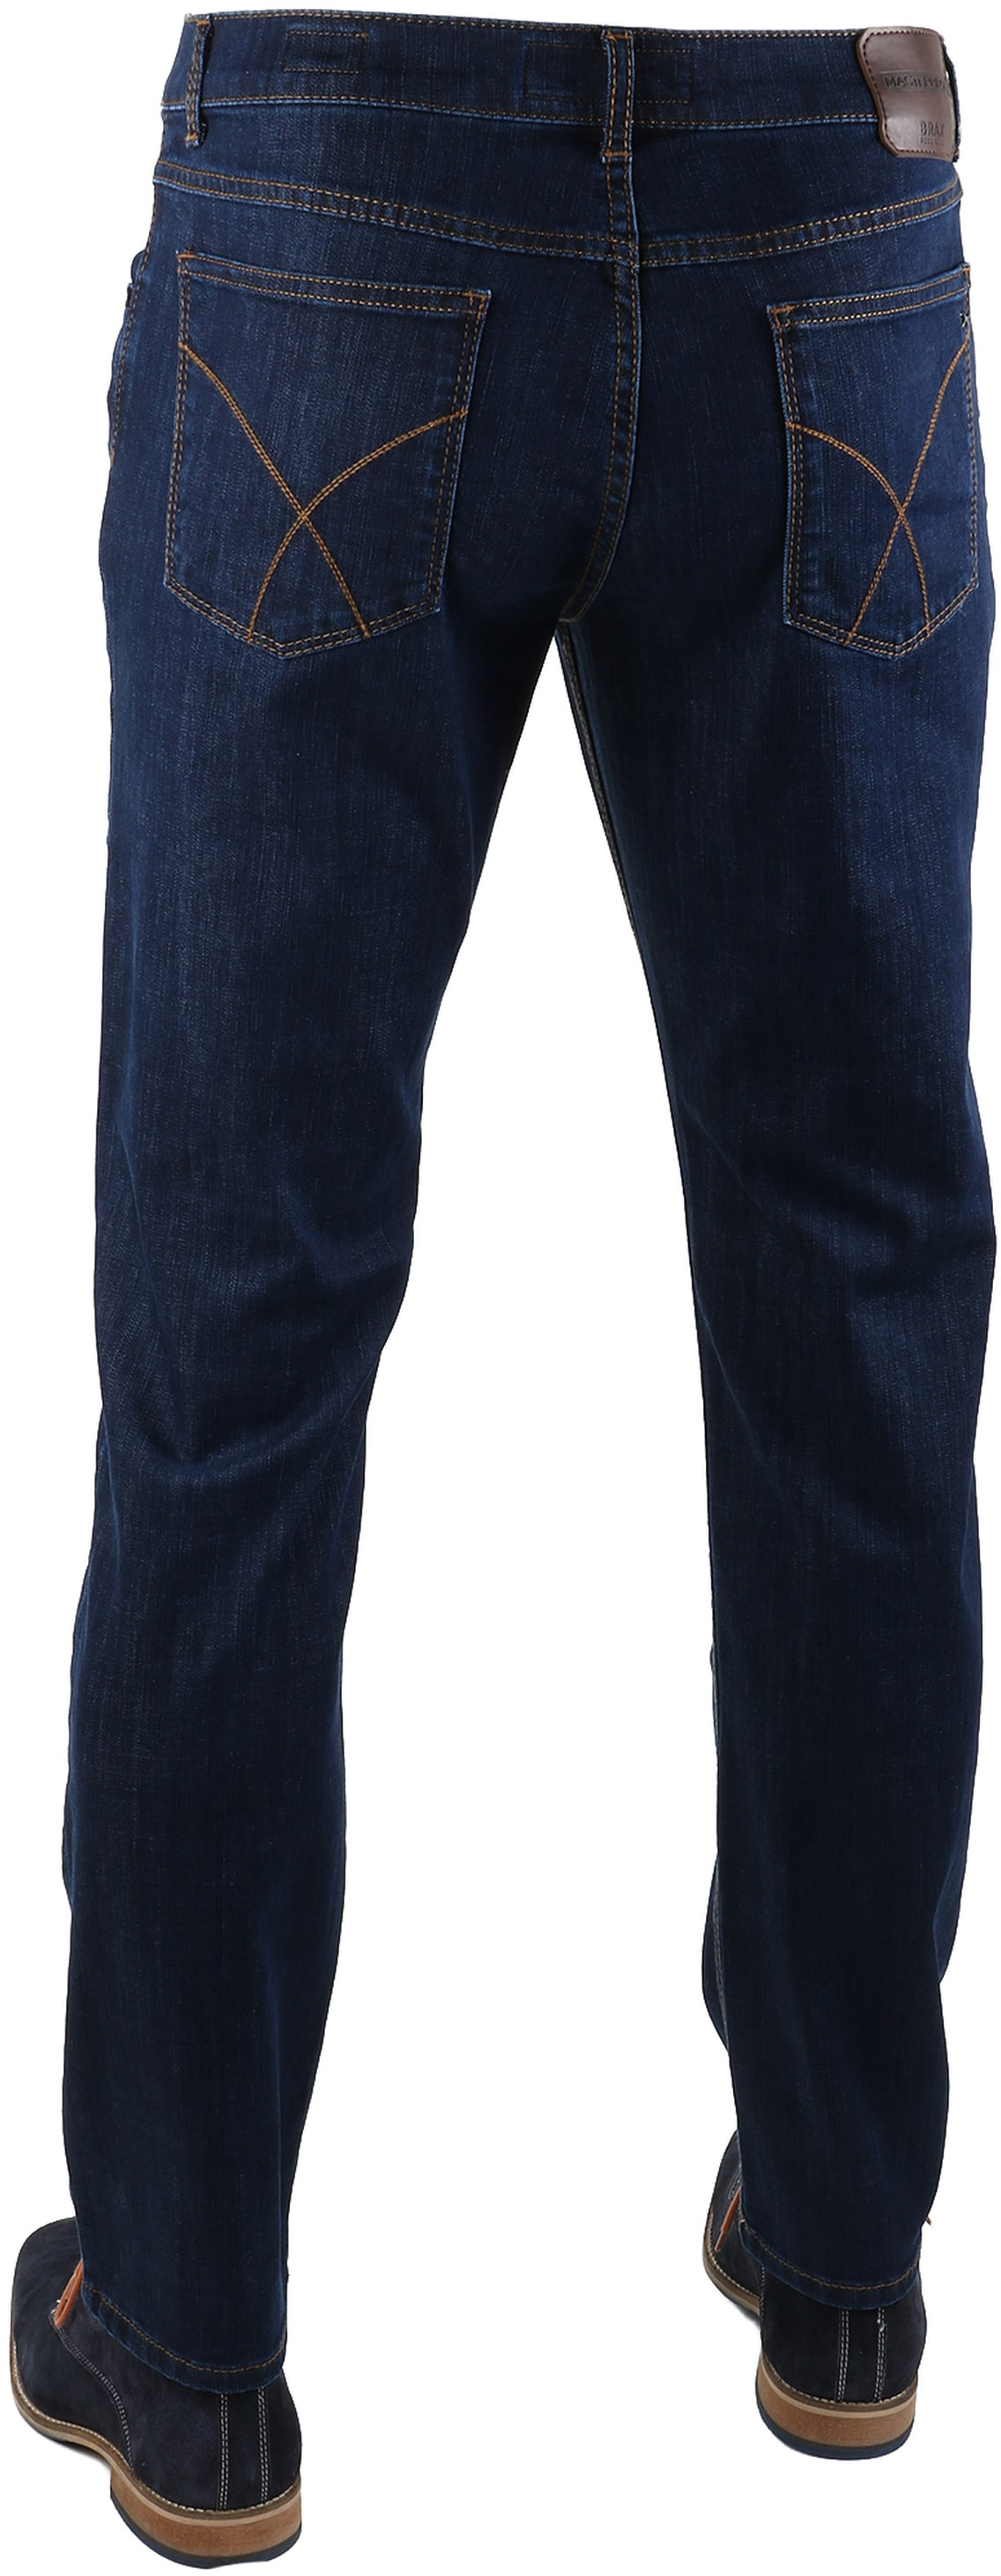 Brax Cooper Denim Jeans Five Pocket foto 1